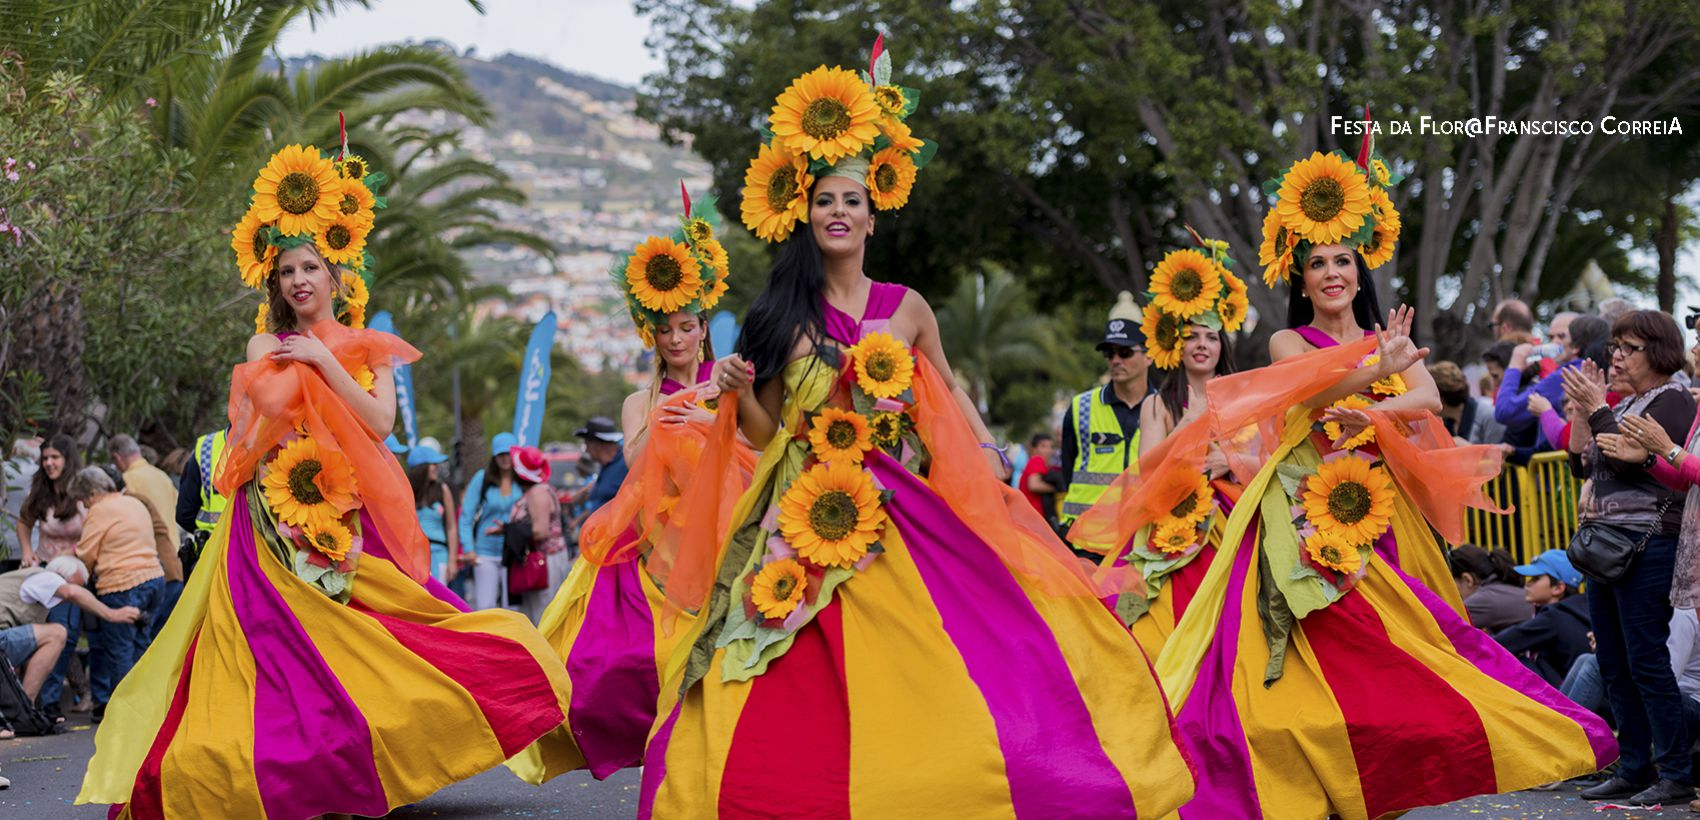 Festa da Flor: Especial Vidamar (4/5 Noites)